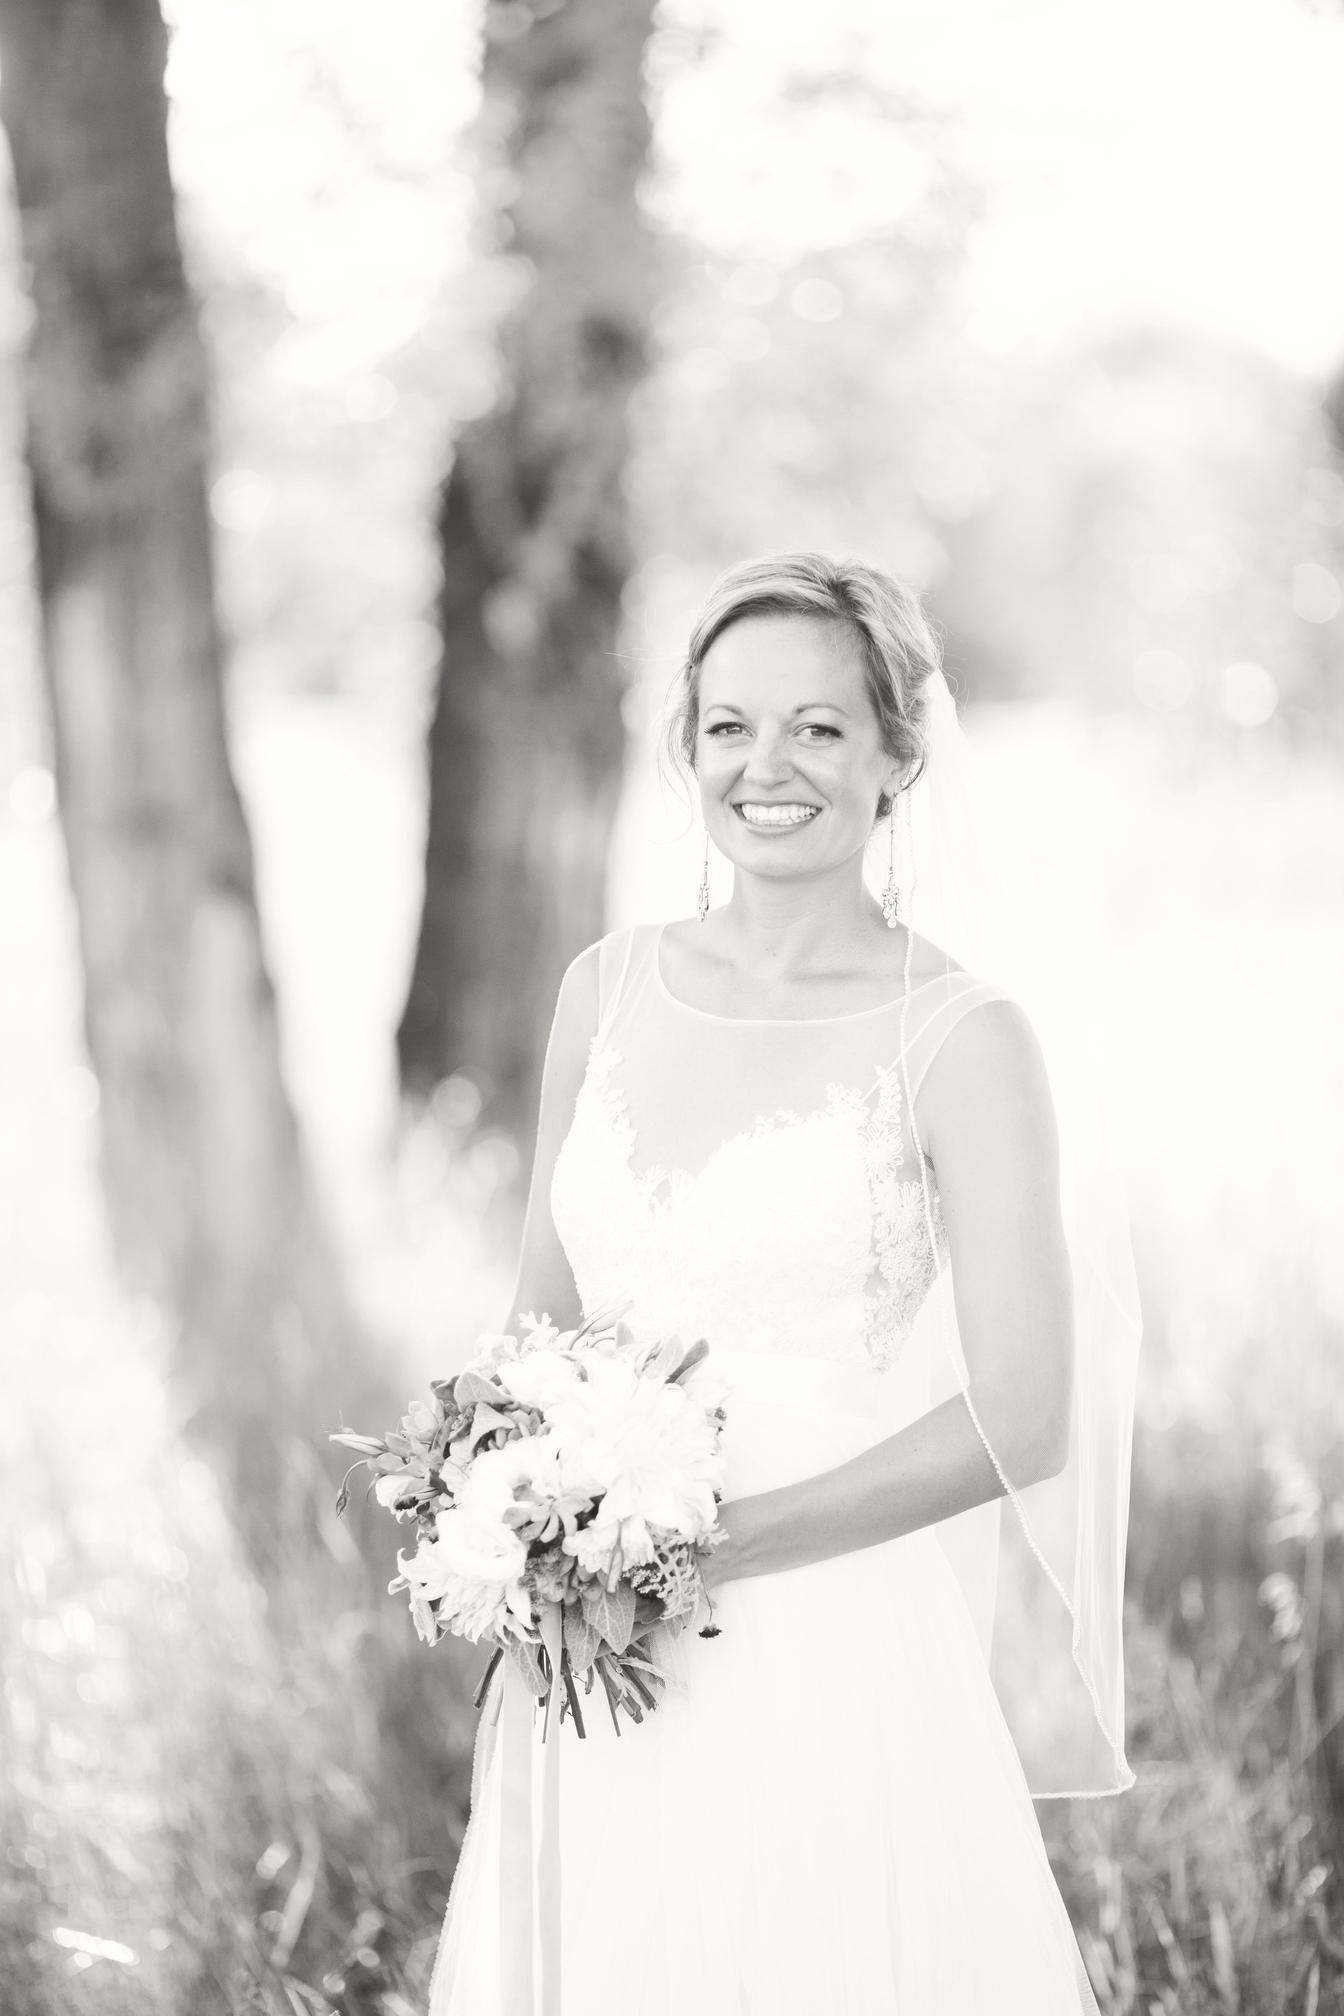 Millett Wedding Jackson Hole 2104_0340A.JPG